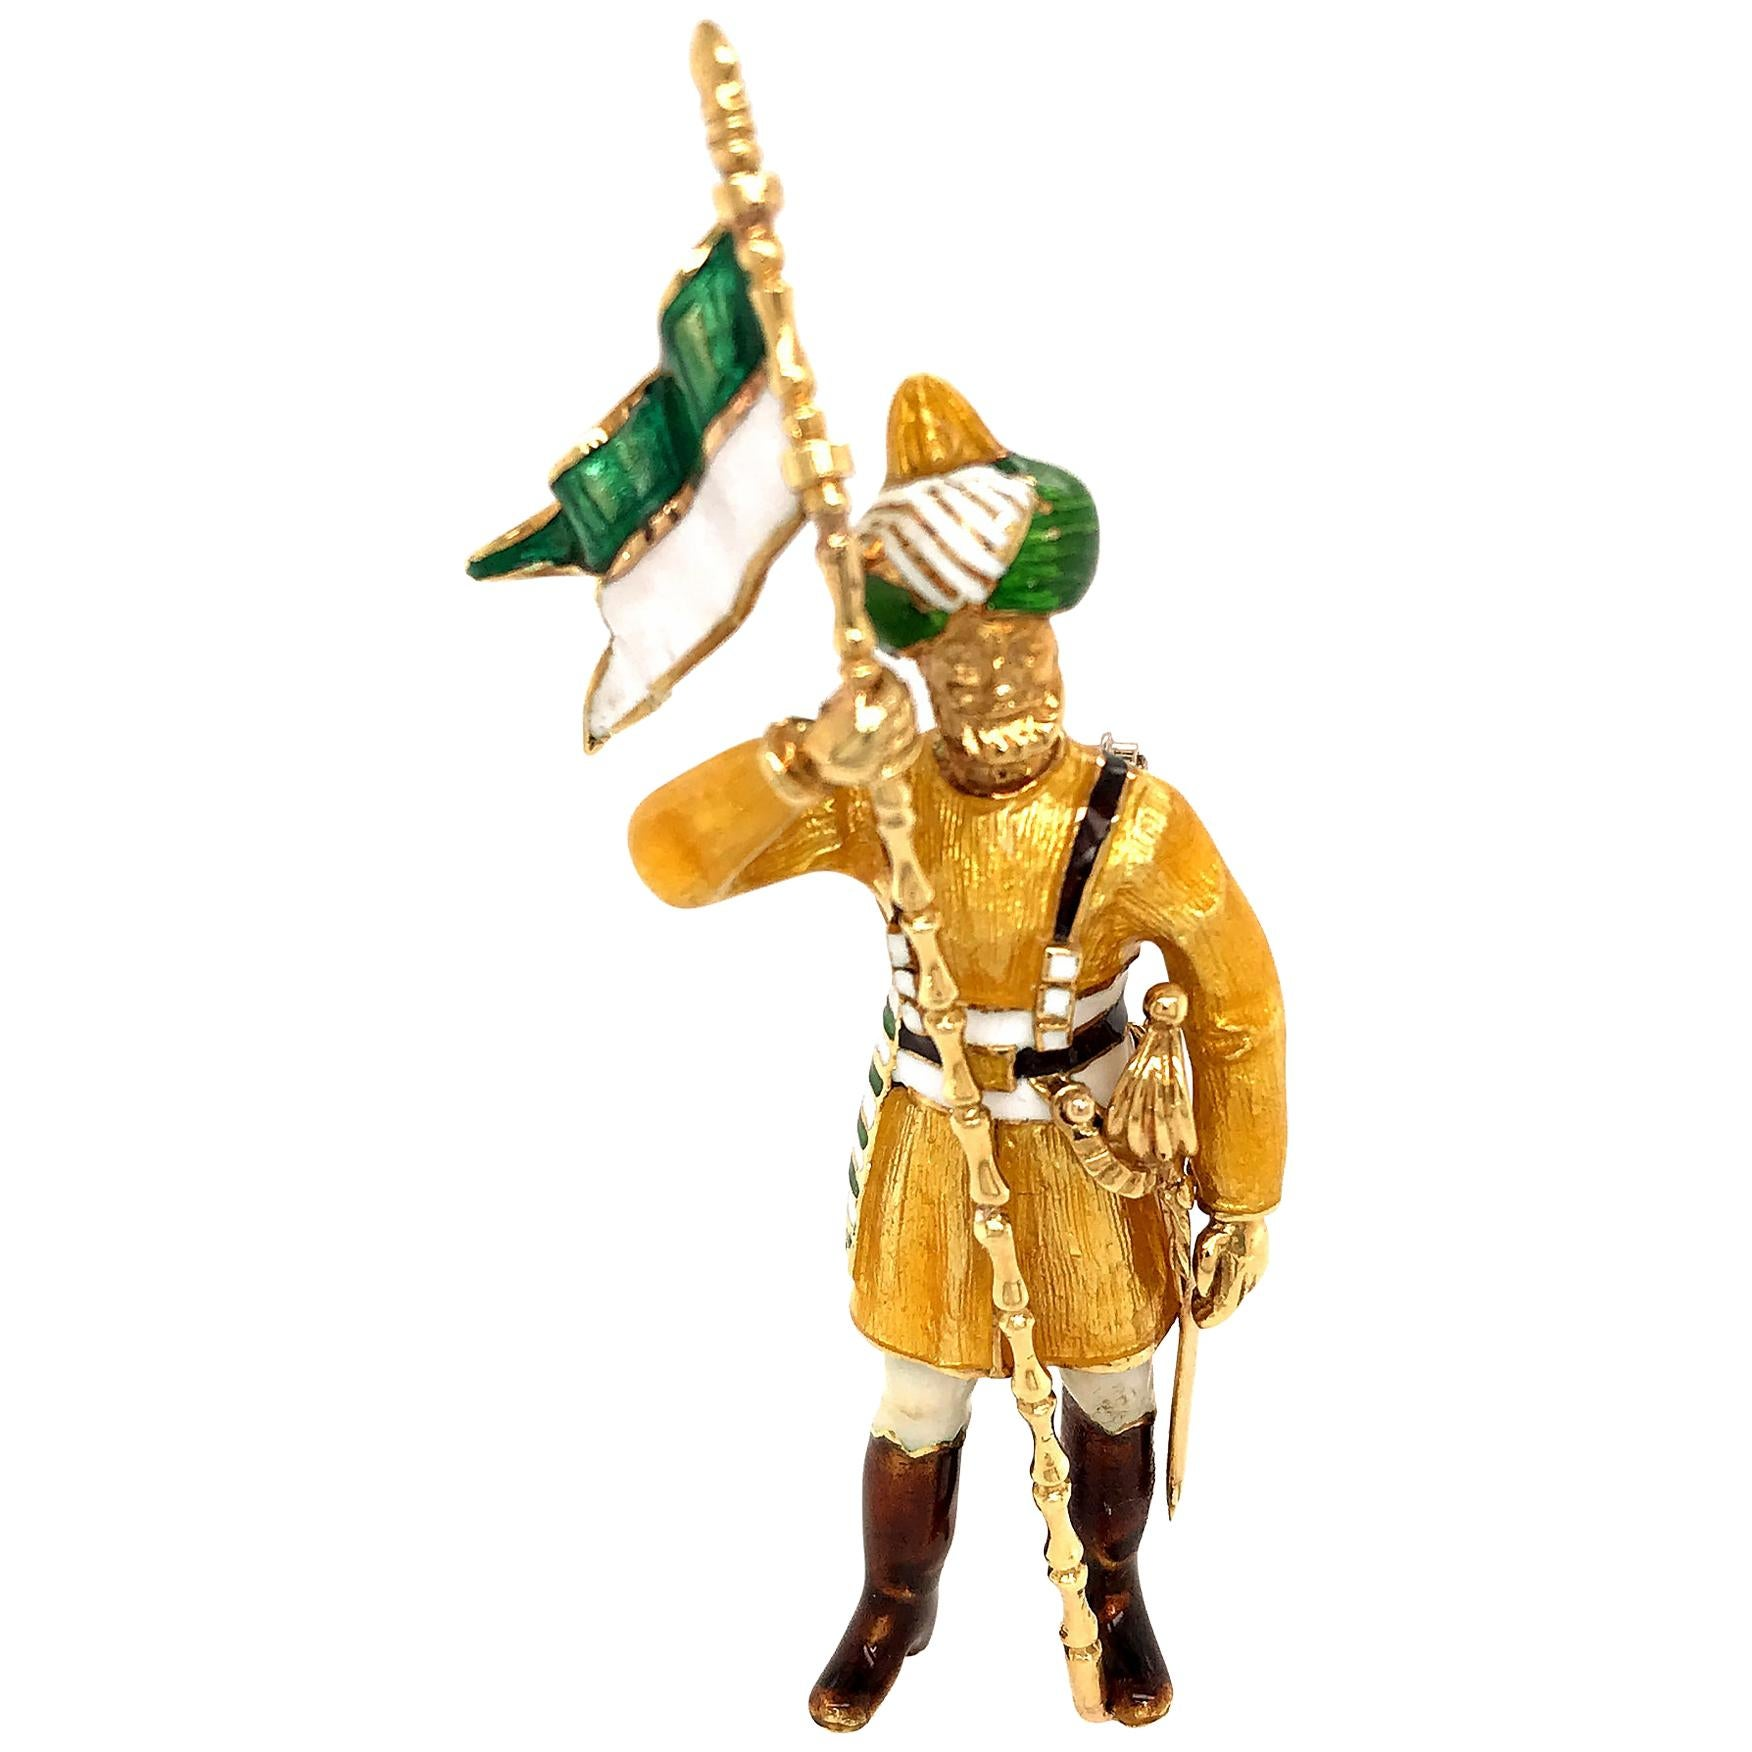 18 Karat Yellow Gold Enamel Soldier Brooch